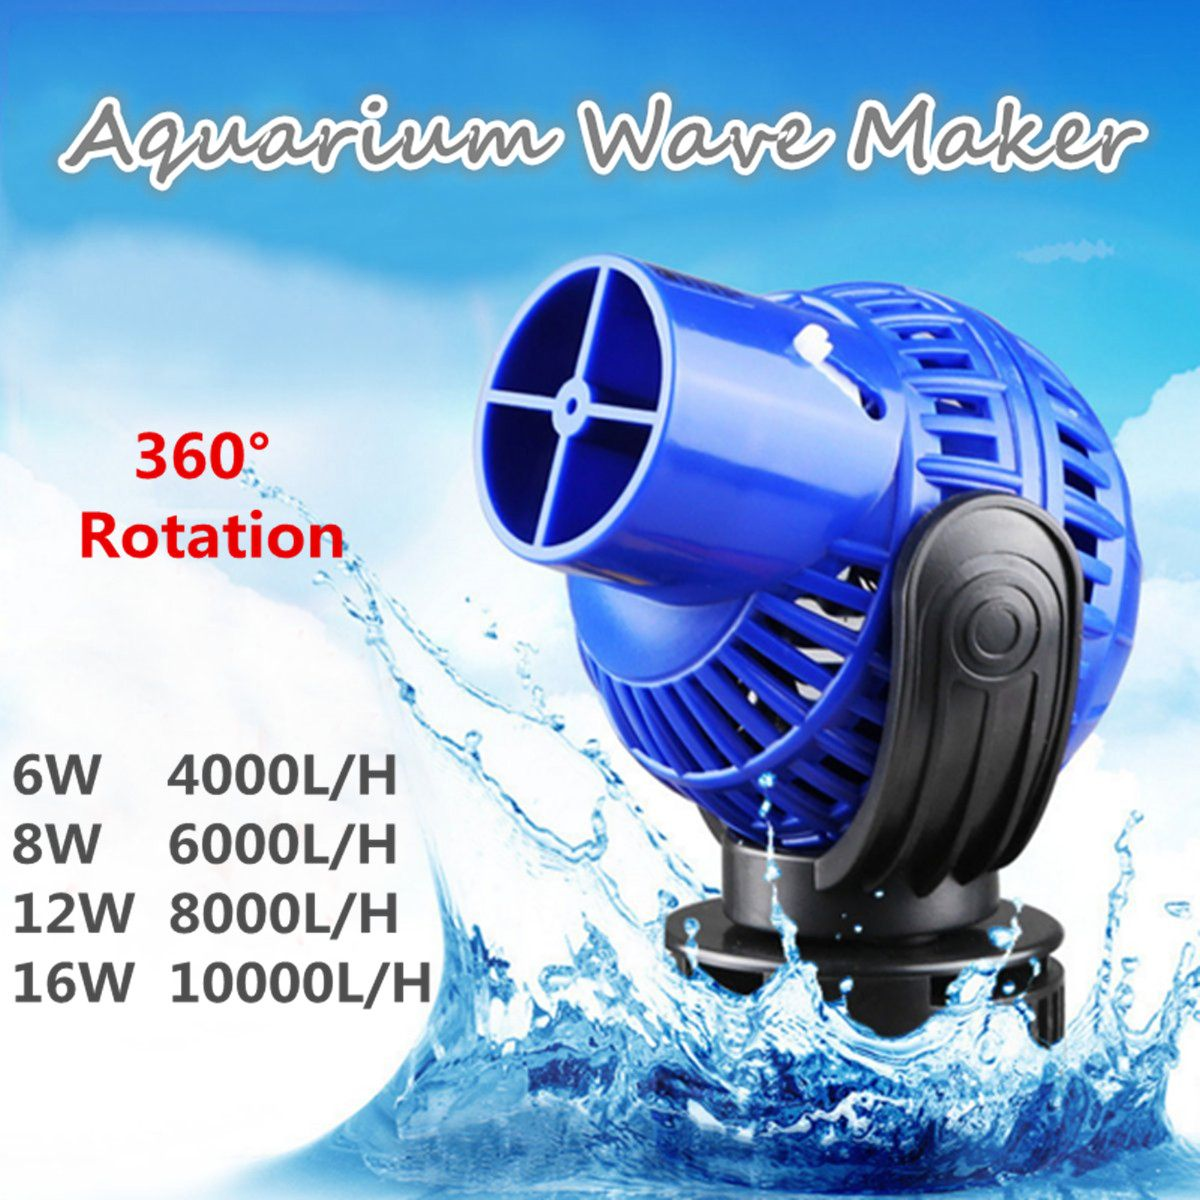 4000-15000L/H Aquarium Fish Tank 360 Water Wave Maker Pump Powerhead Magnet Base Wave Maker For Aquarium Fish Tank Aquarium Pump